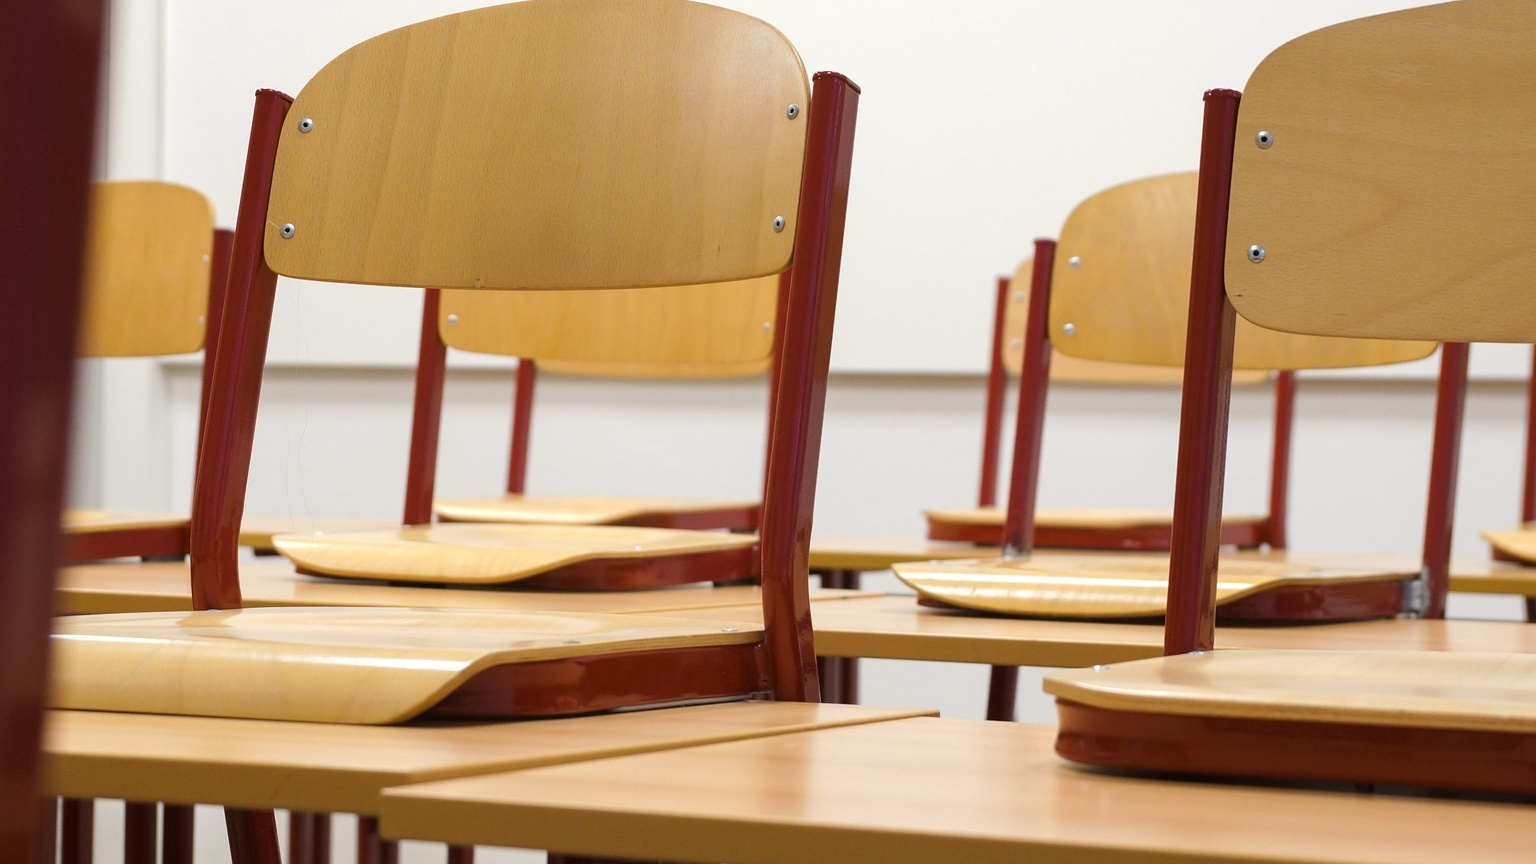 classroom-824120_1920 Cropped_1540816581135.jpg.jpg